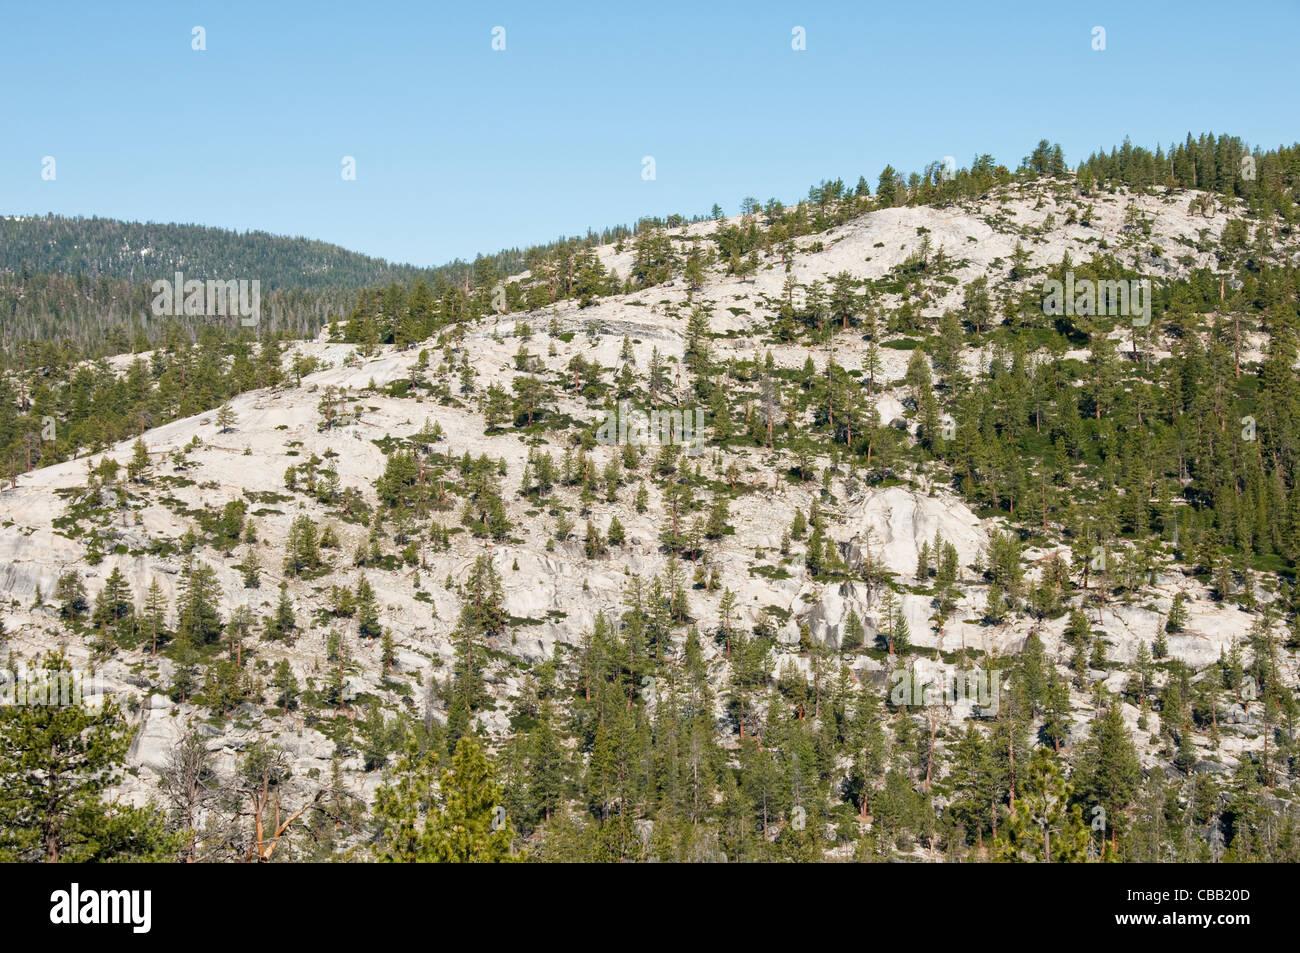 Granite scenic rock slabs mountain high country Yosemite National Park California - Stock Image